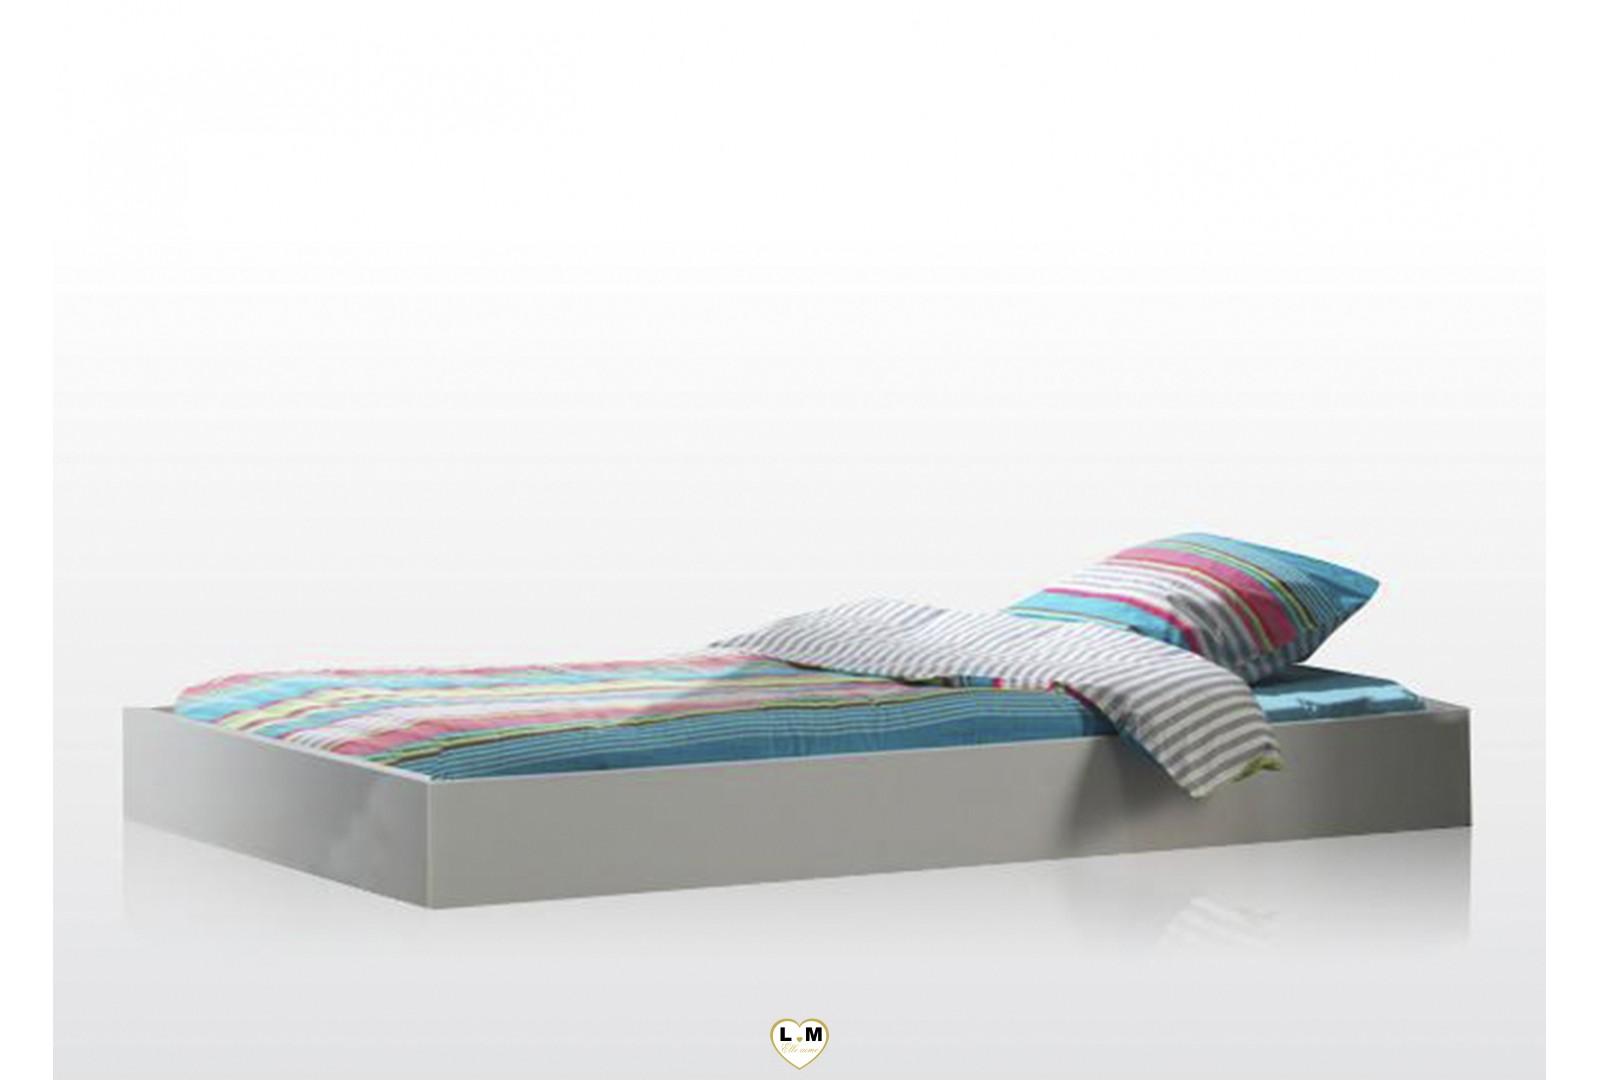 laramy chambre ado le tiroir lit gigogne lignemeuble com. Black Bedroom Furniture Sets. Home Design Ideas